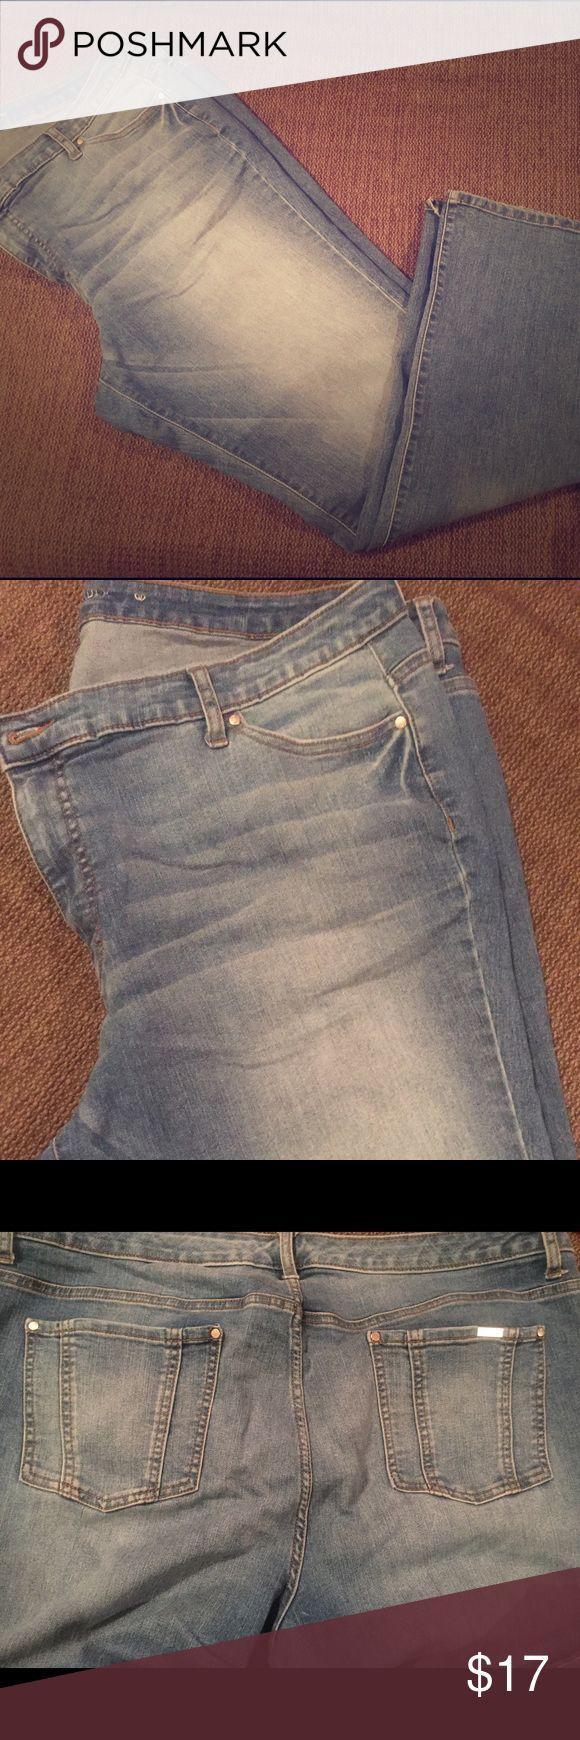 Jennifer Lopez Bootcut Jeans Jennifer Lopez Bootcut Jeans in size 20. Gently worn on bottom hem. Very comfortable! Jennifer Lopez Jeans Boot Cut